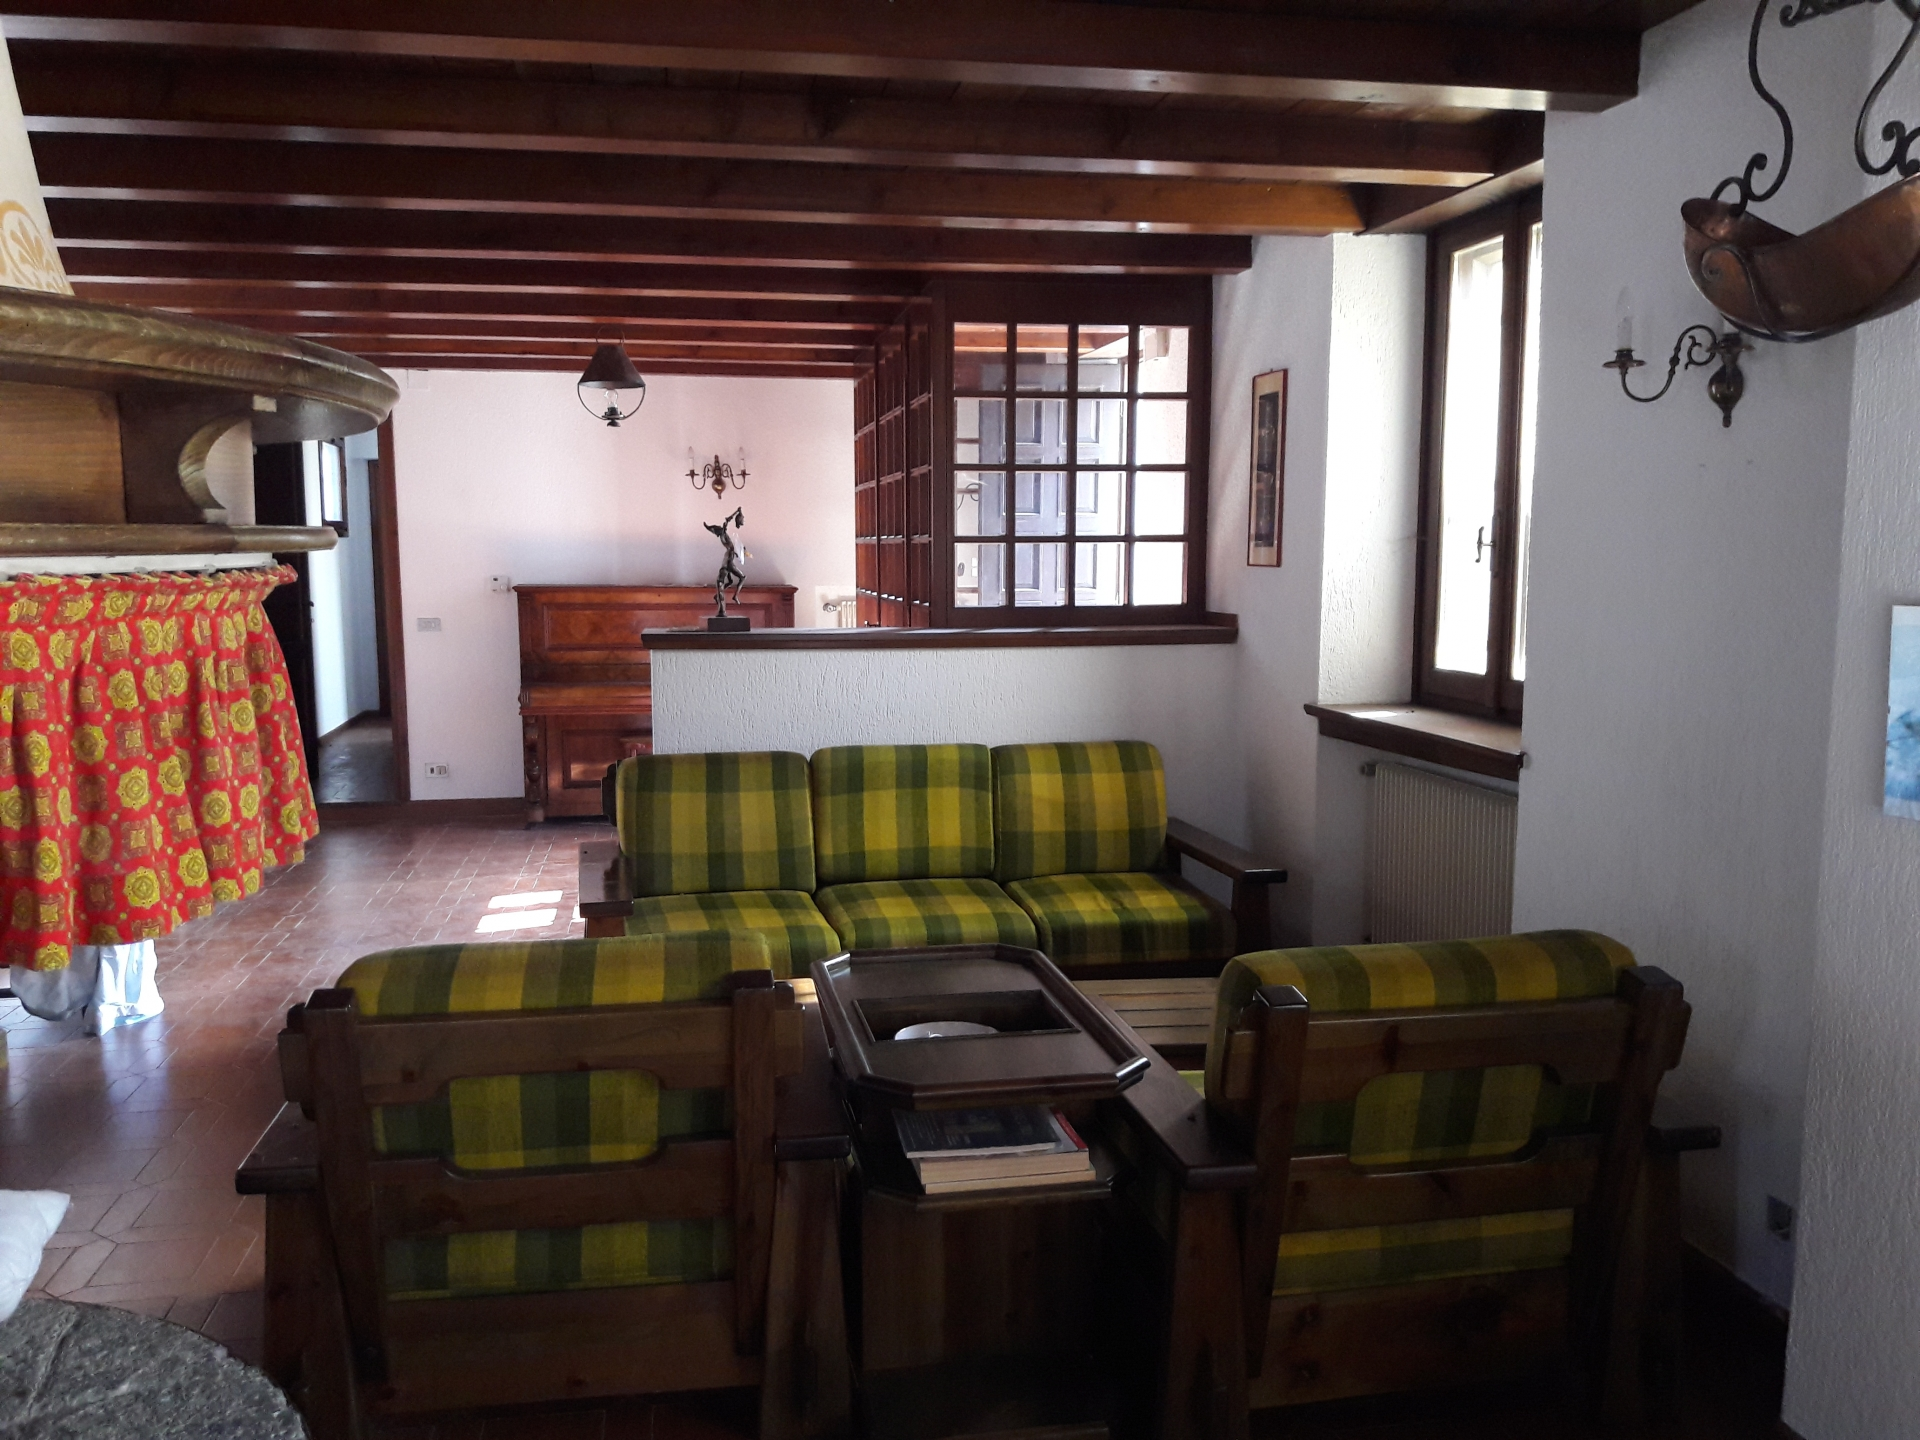 Casa in vendita a San Daniele del Friuli - Slideshow 6